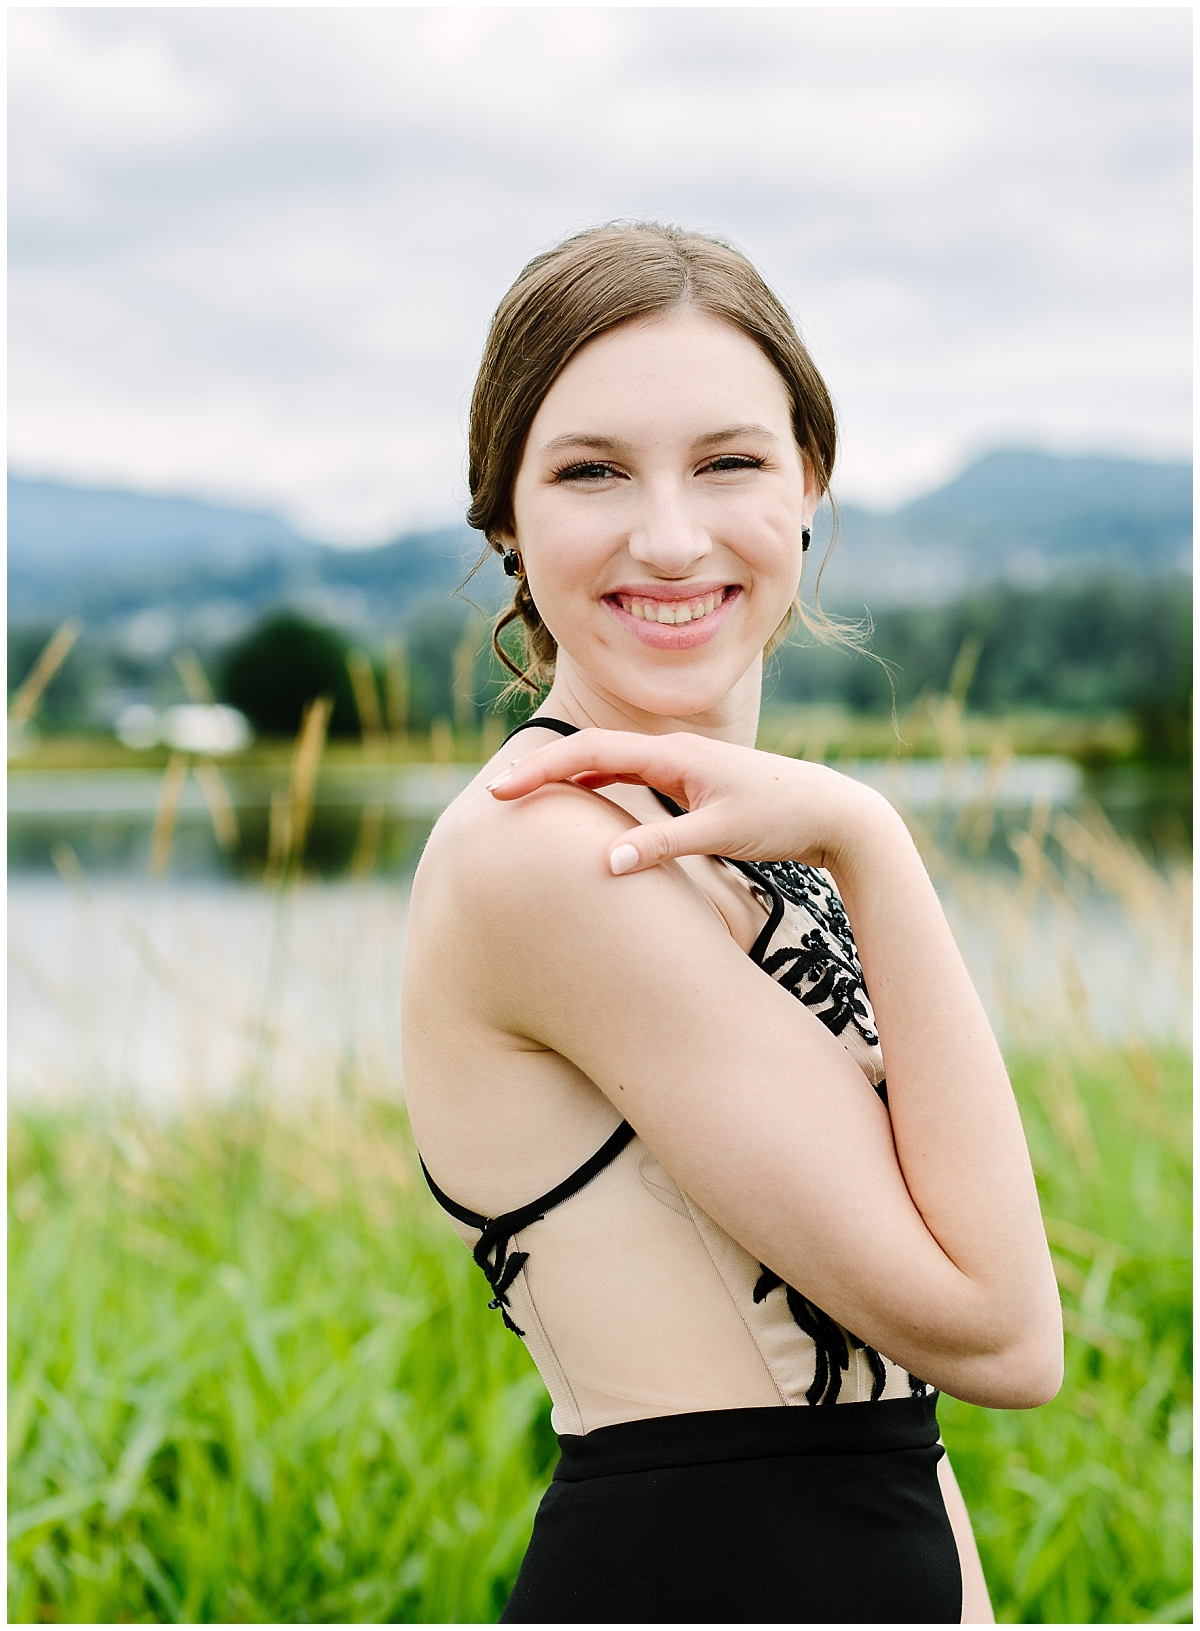 abbotsford-british-columbia- prom photographer- graduation-photographs-claudia-wyler-photography